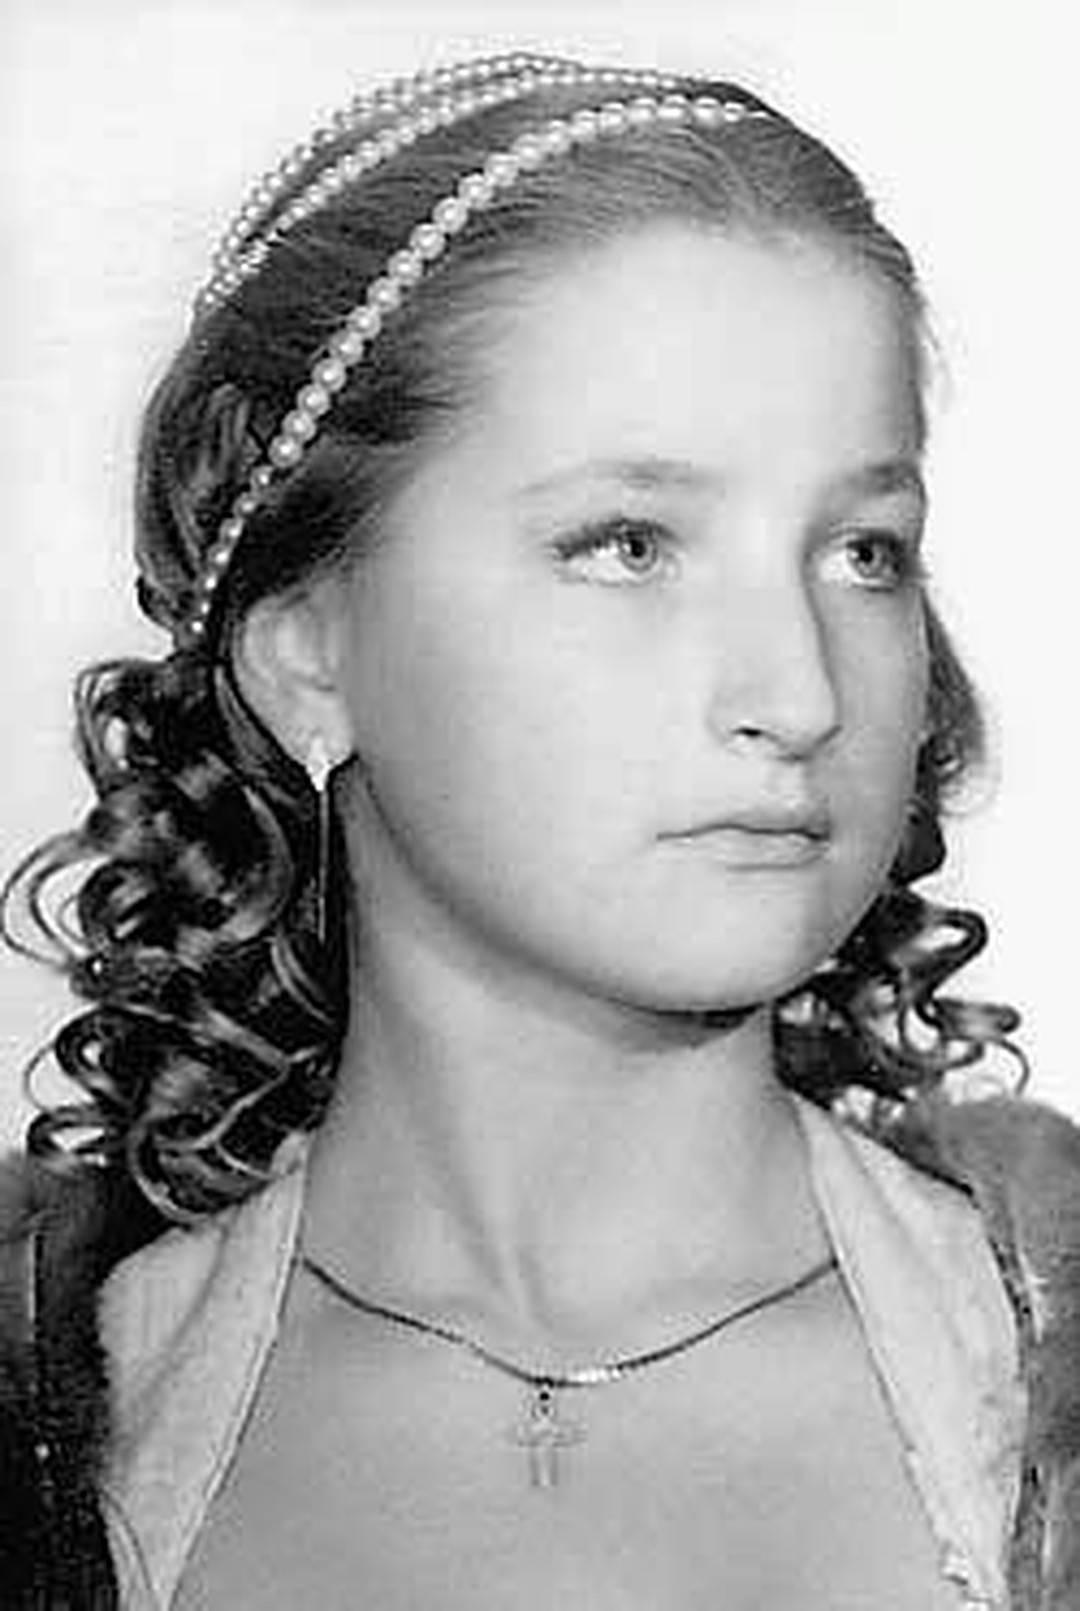 Людмила максакова – фото, биография, личная жизнь, новости, актриса 2021 - 24сми